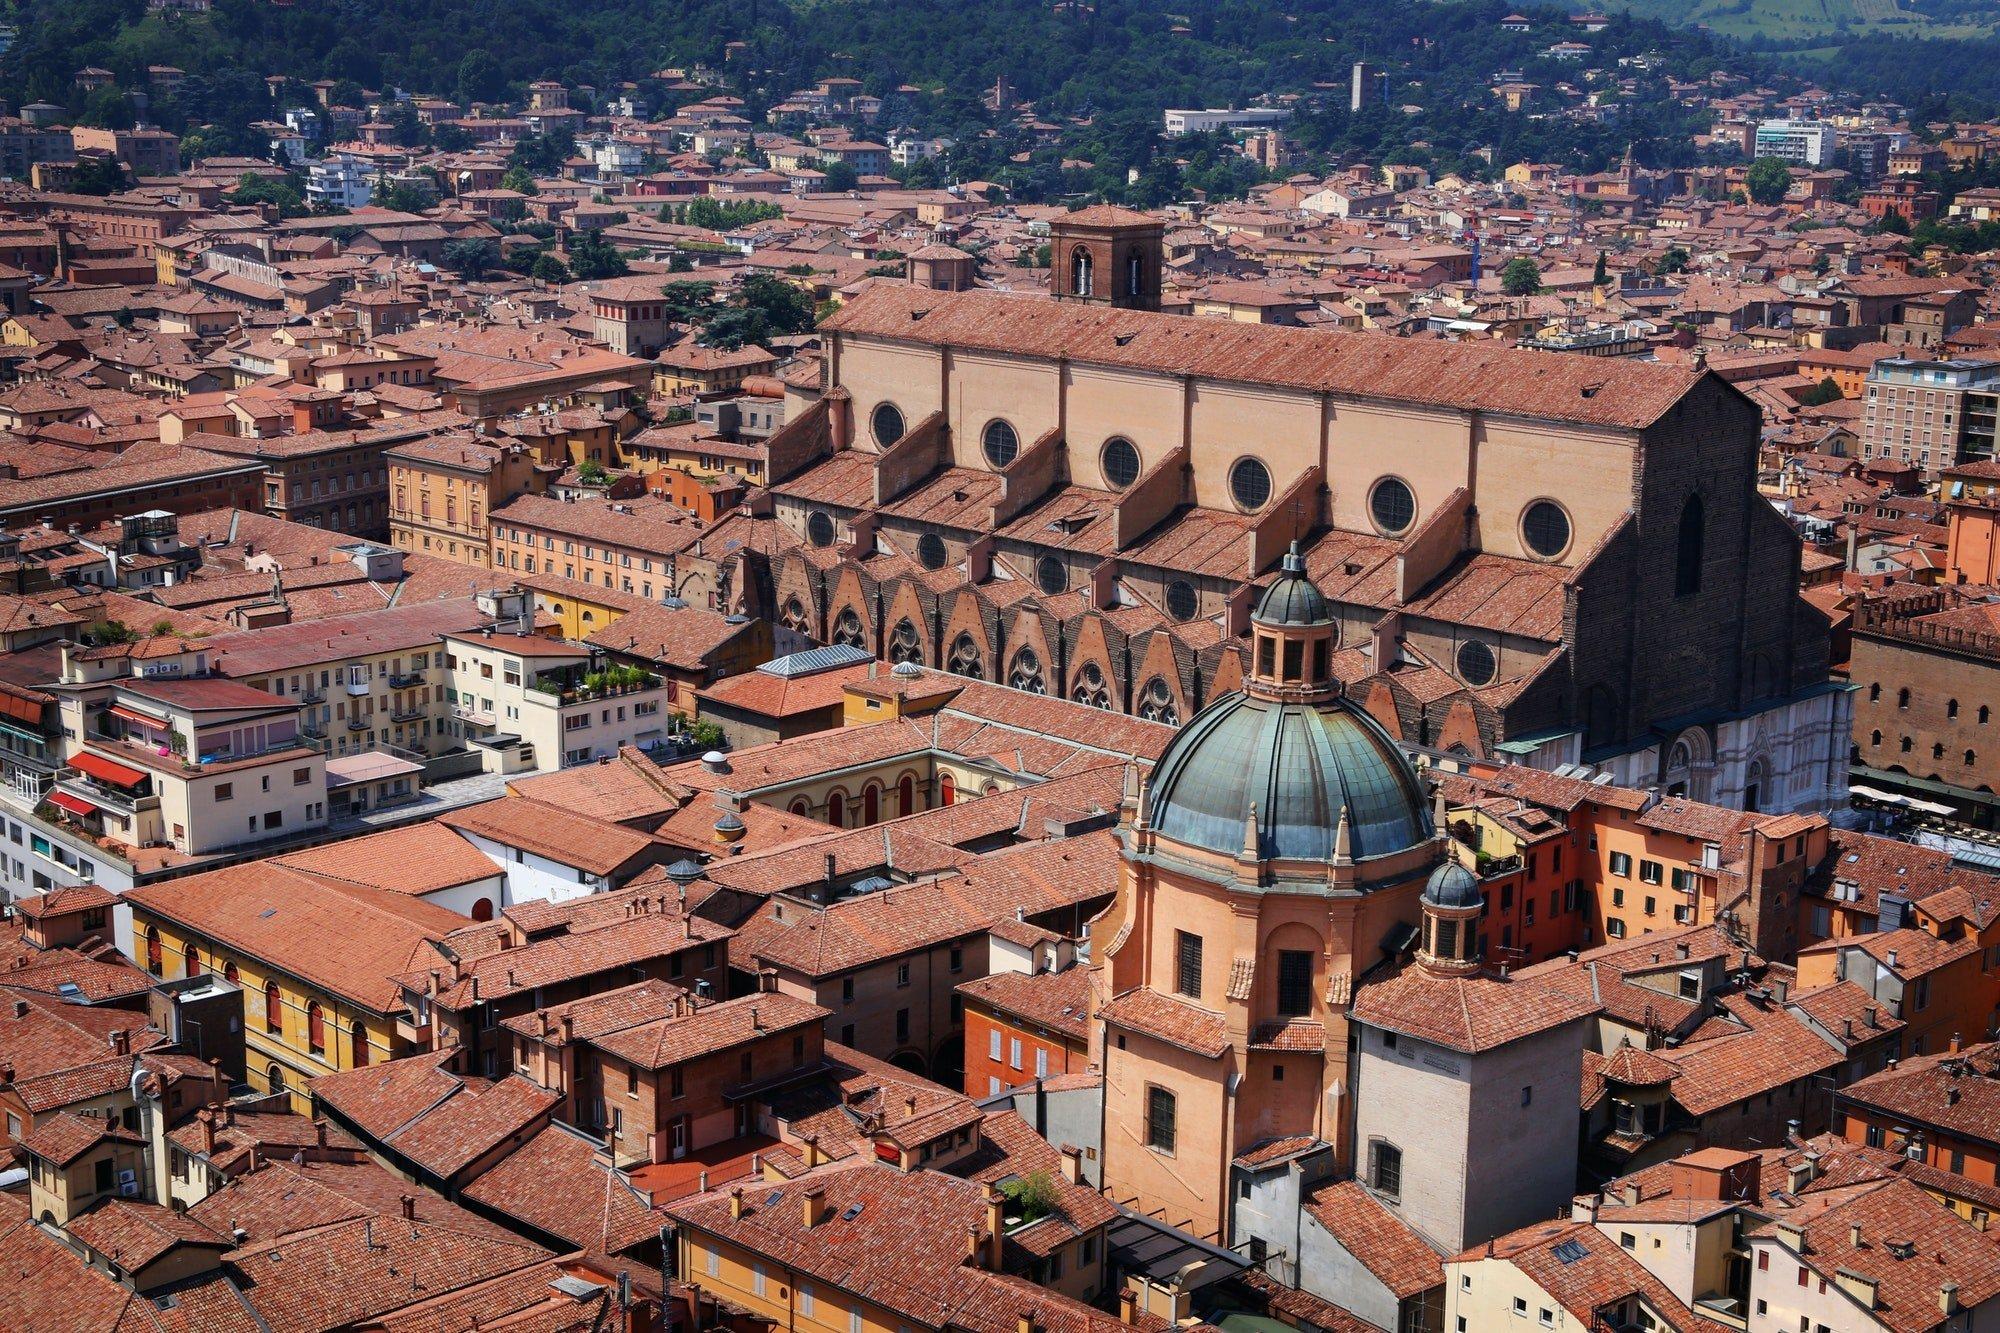 Aerial view of Bologna, Italy city center. Piazza Maggiore, with San Petronio Basilica